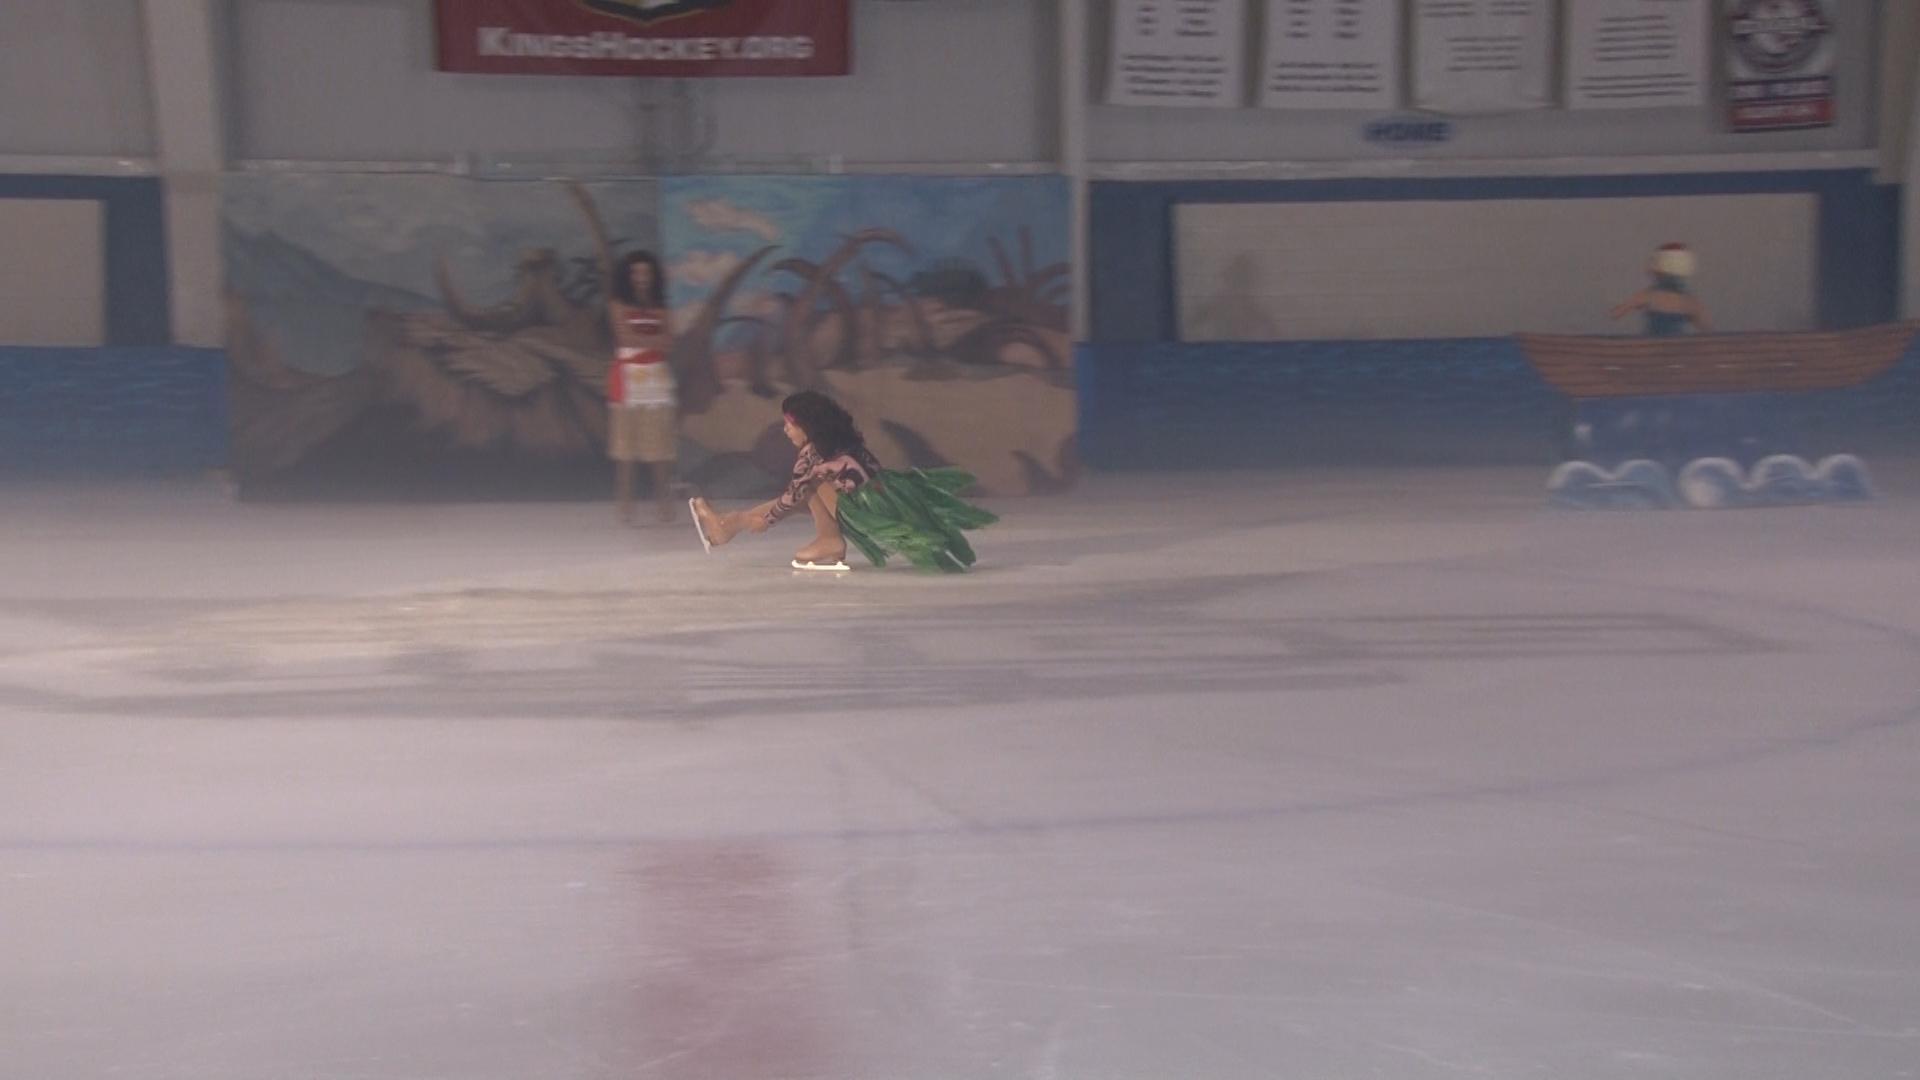 Power Play Maui Skate on Ice 071417.00_32_34_22.Still052.jpg